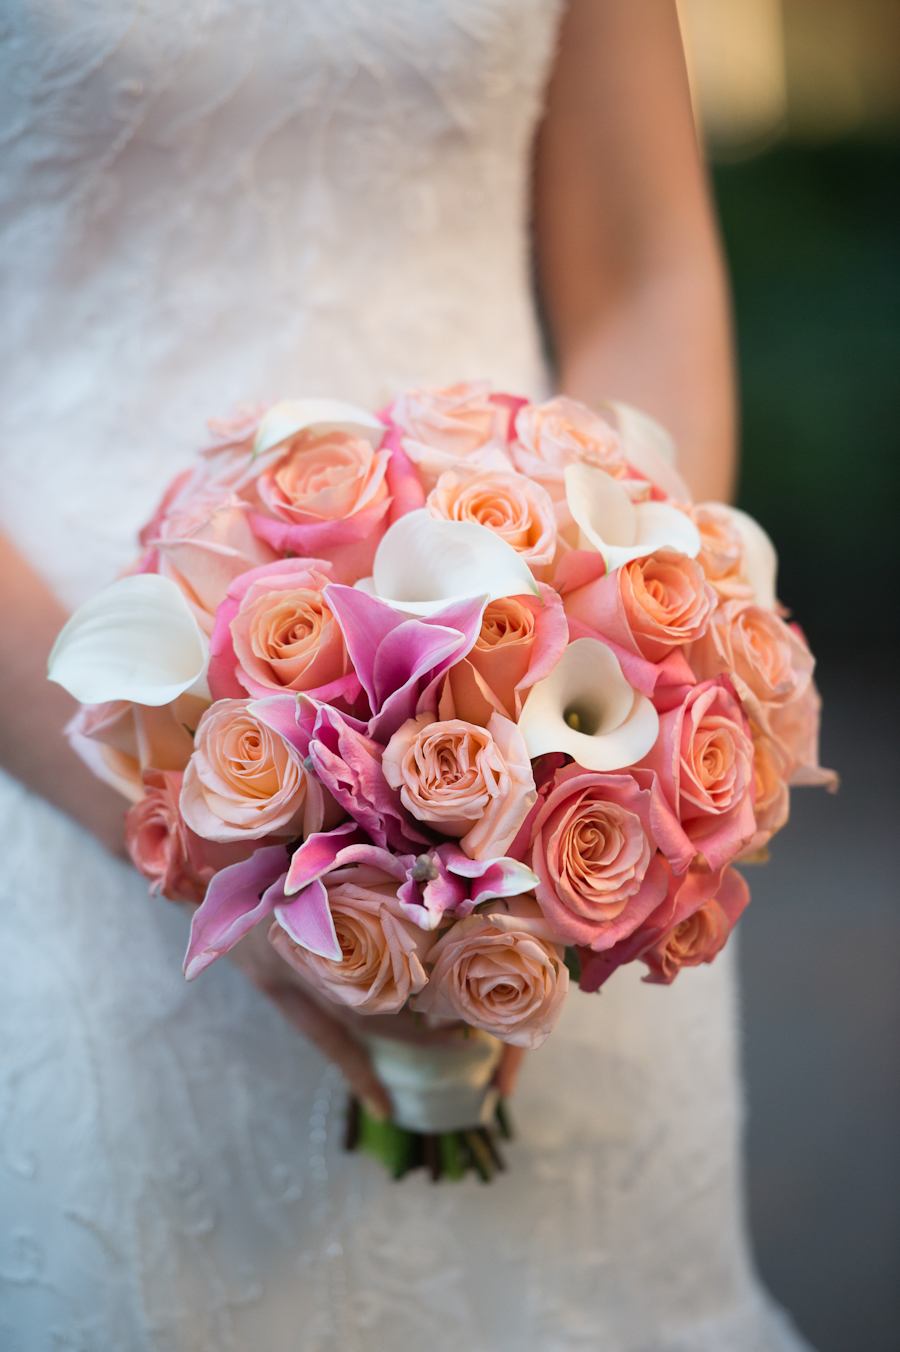 gotham hall brian hatton ang weddings and events-24.jpg